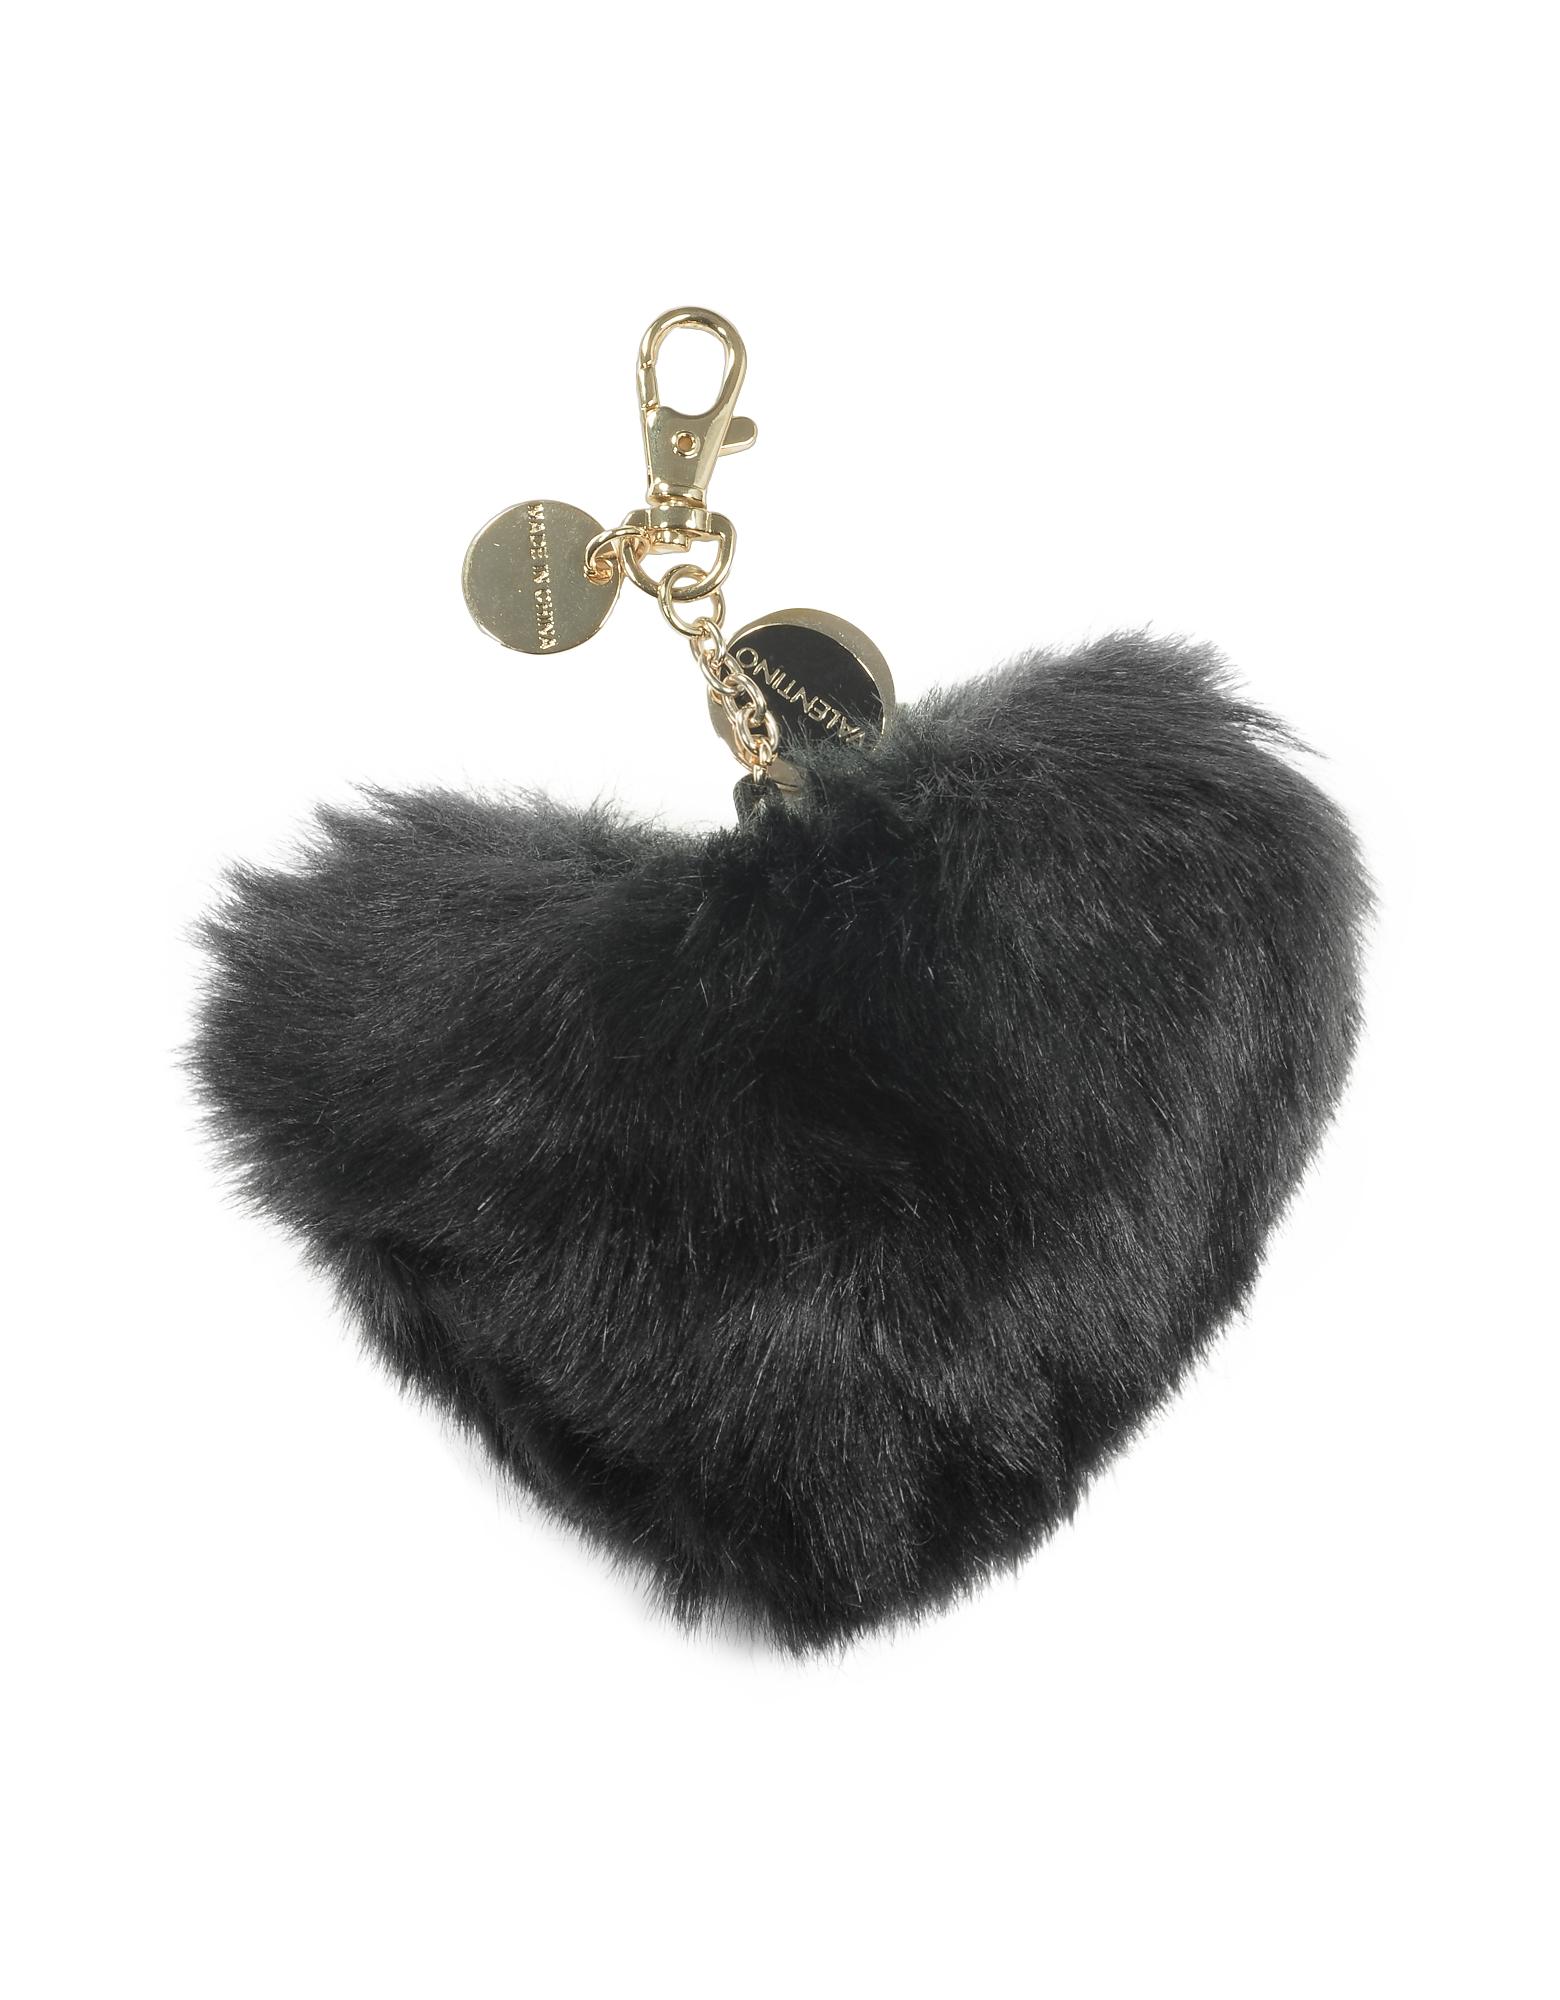 Valentino by Mario Valentino Designer Key Holders, Furry Hear Key-Fob